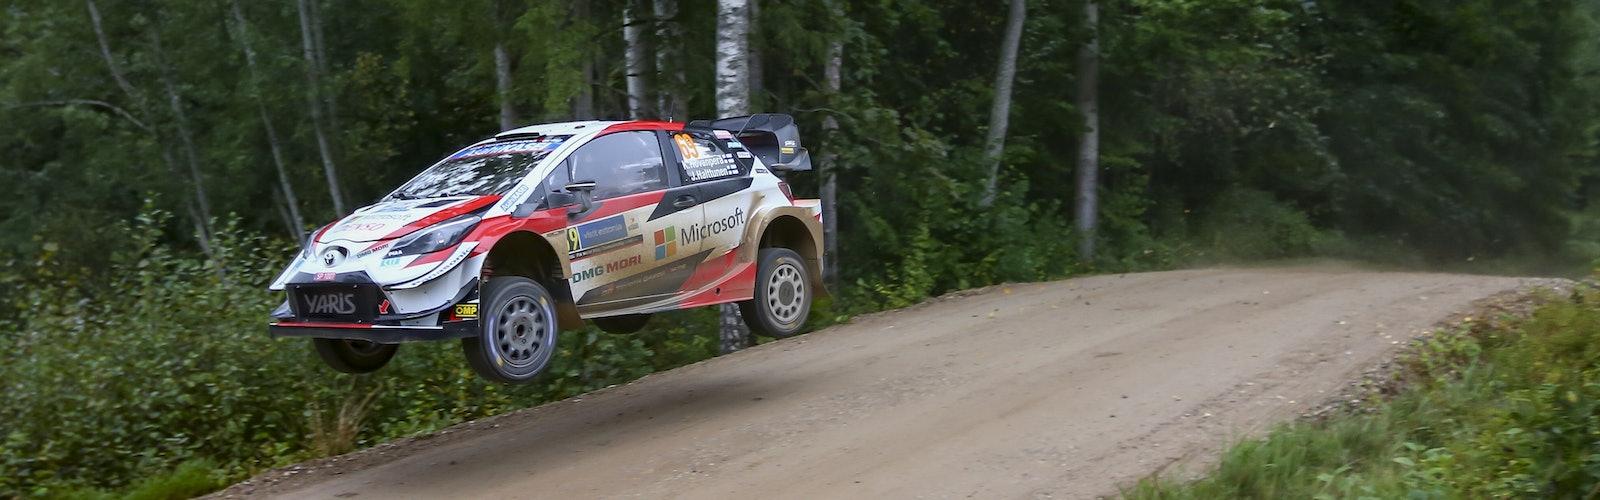 WRC_2020_Rd.4_202